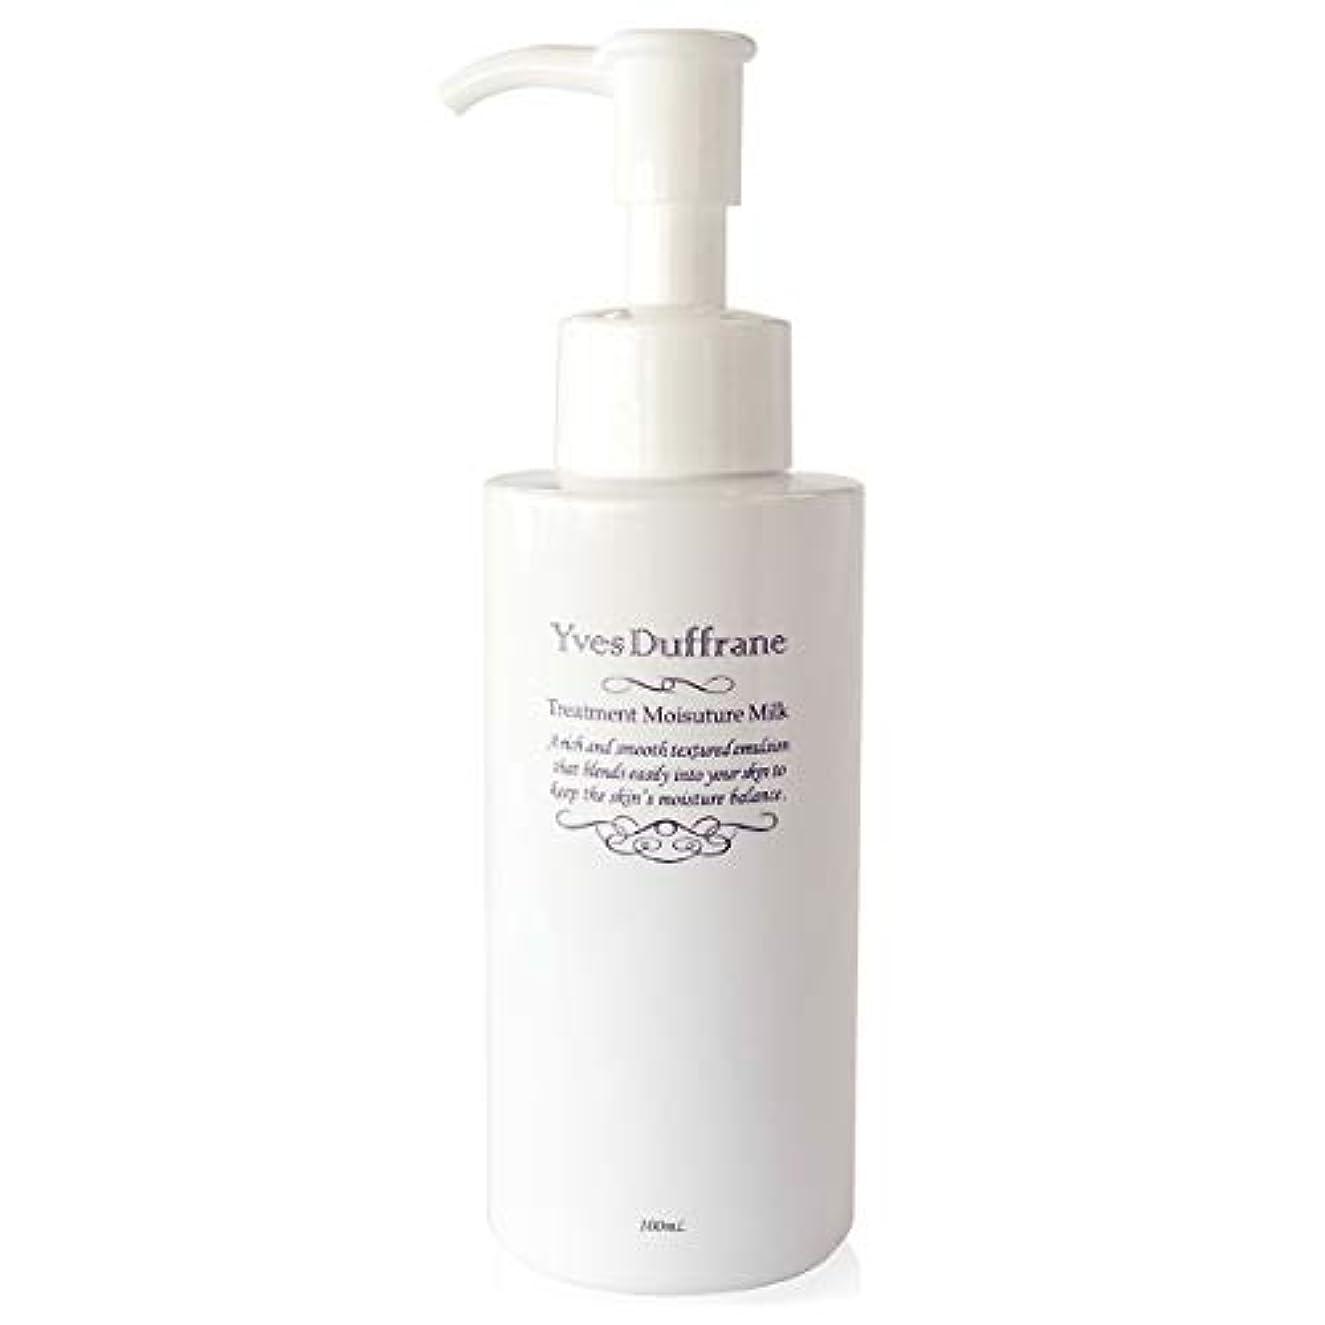 好奇心盛モーター乳白色乳液/セラミド アミノ酸 配合 [ 美容乳液 ] 増粘剤不使用 保湿 乾燥?敏感肌対応